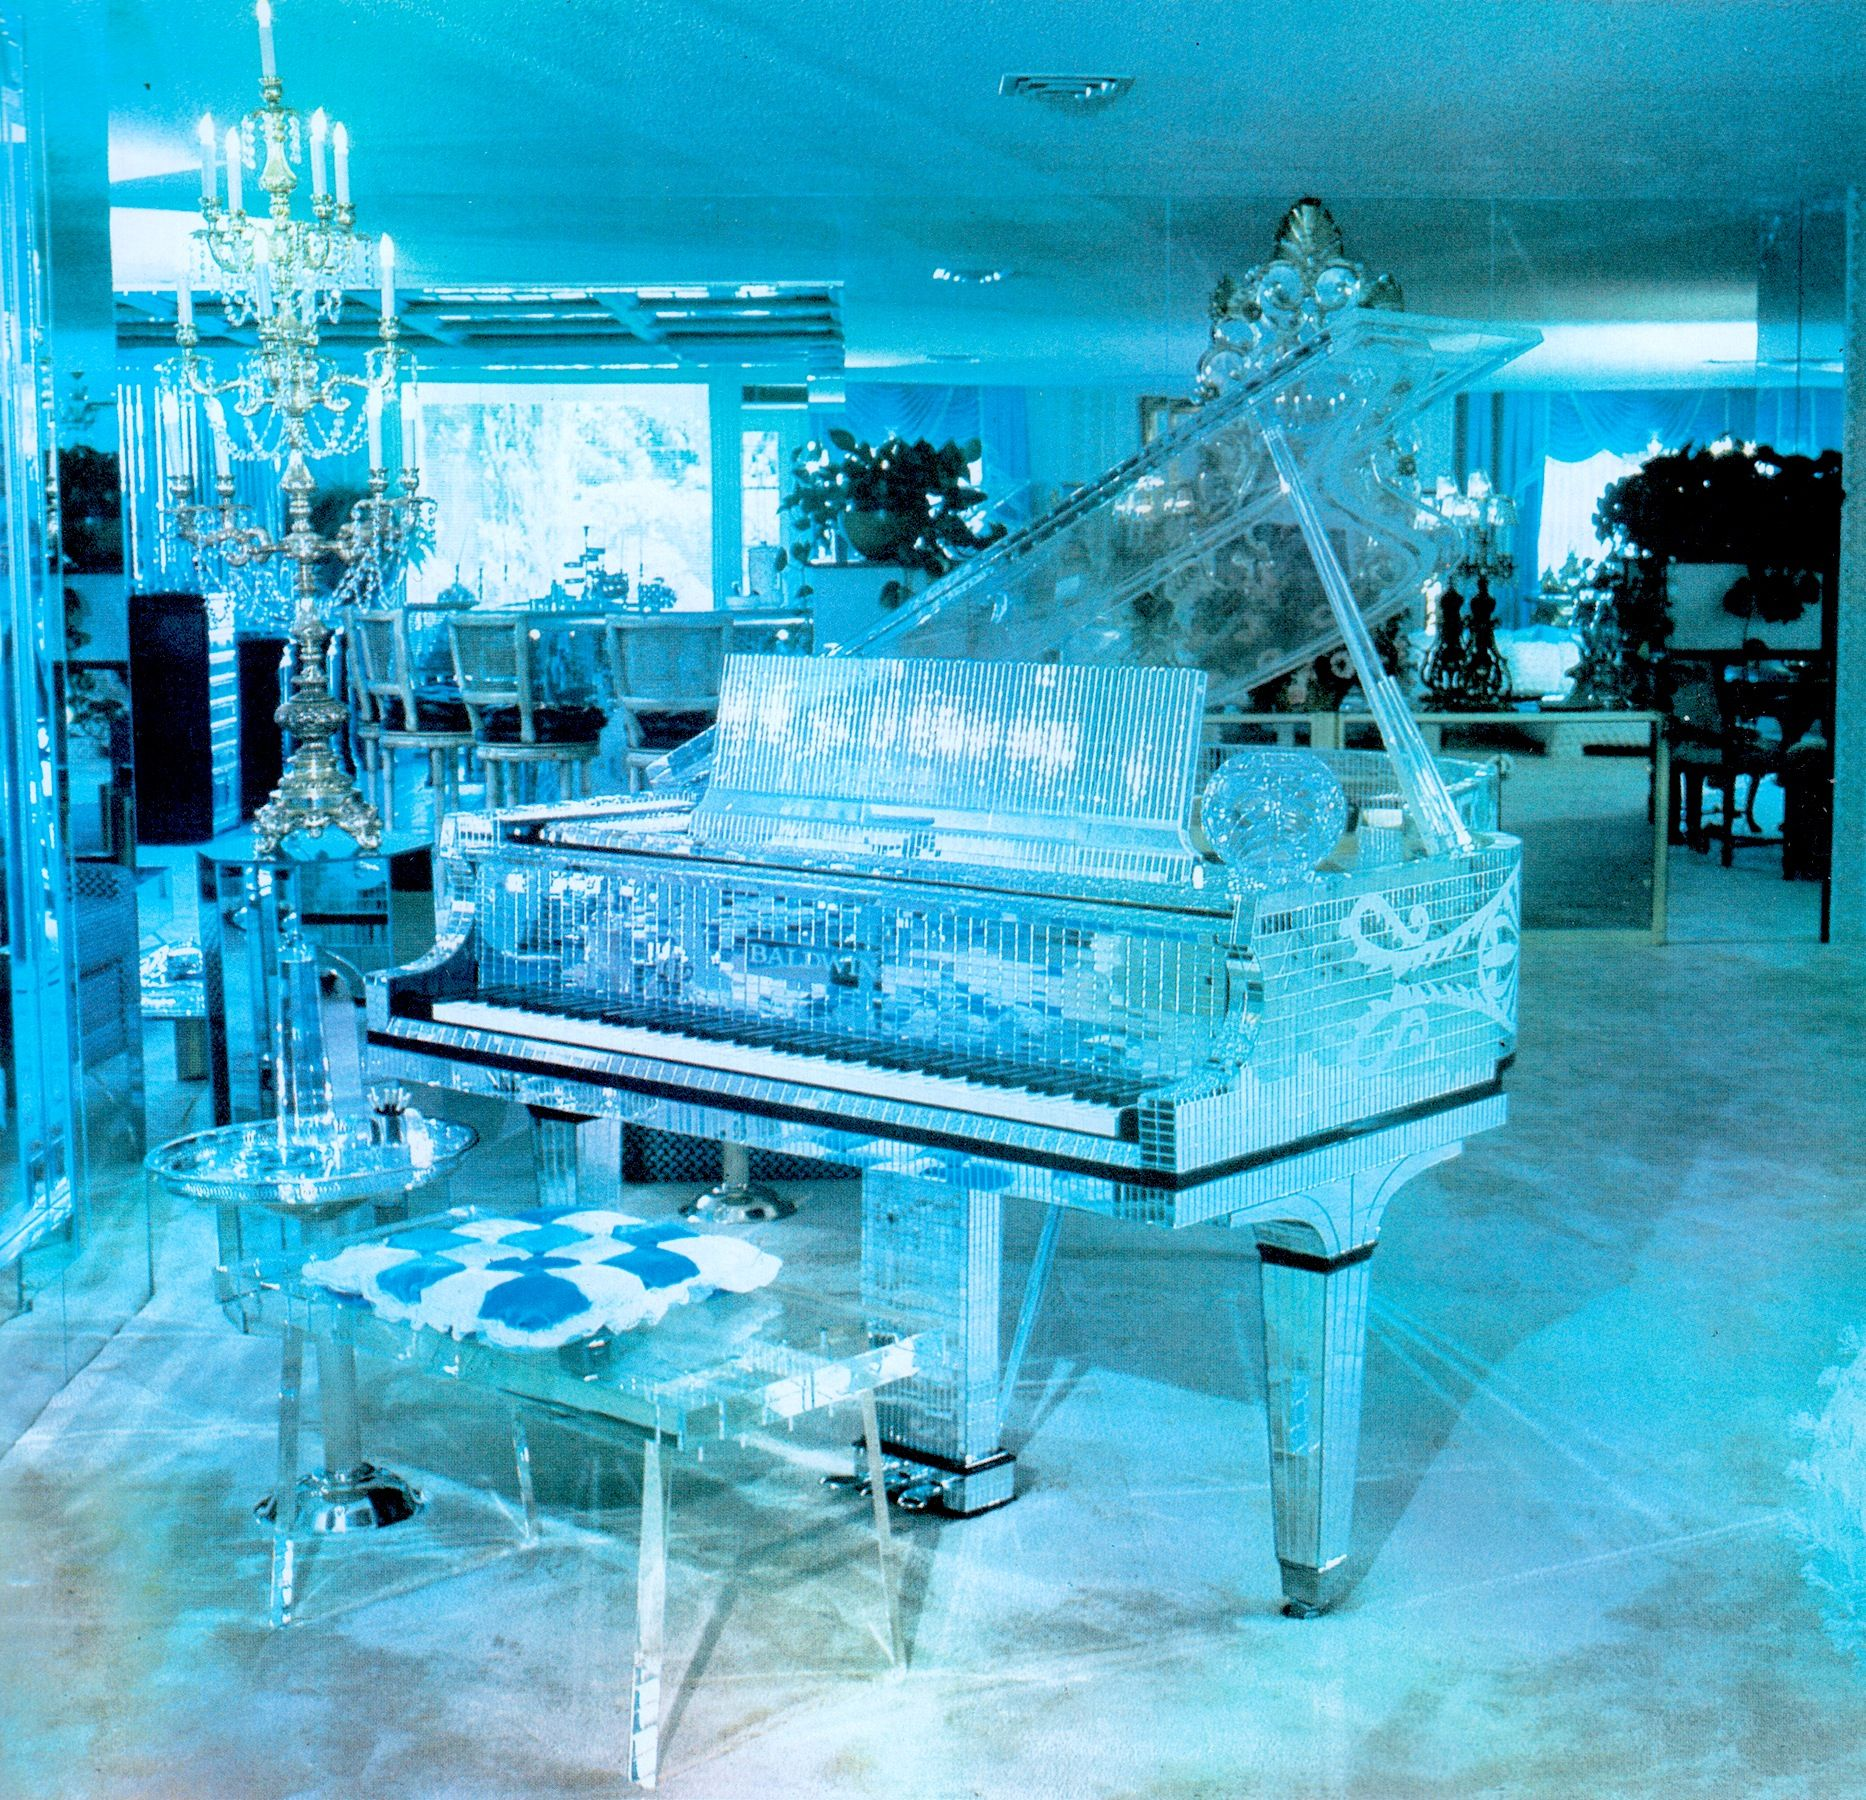 Living Room Sets Las Vegas Liberaces Living Room At His Now Restored Las Vegas Mansion As